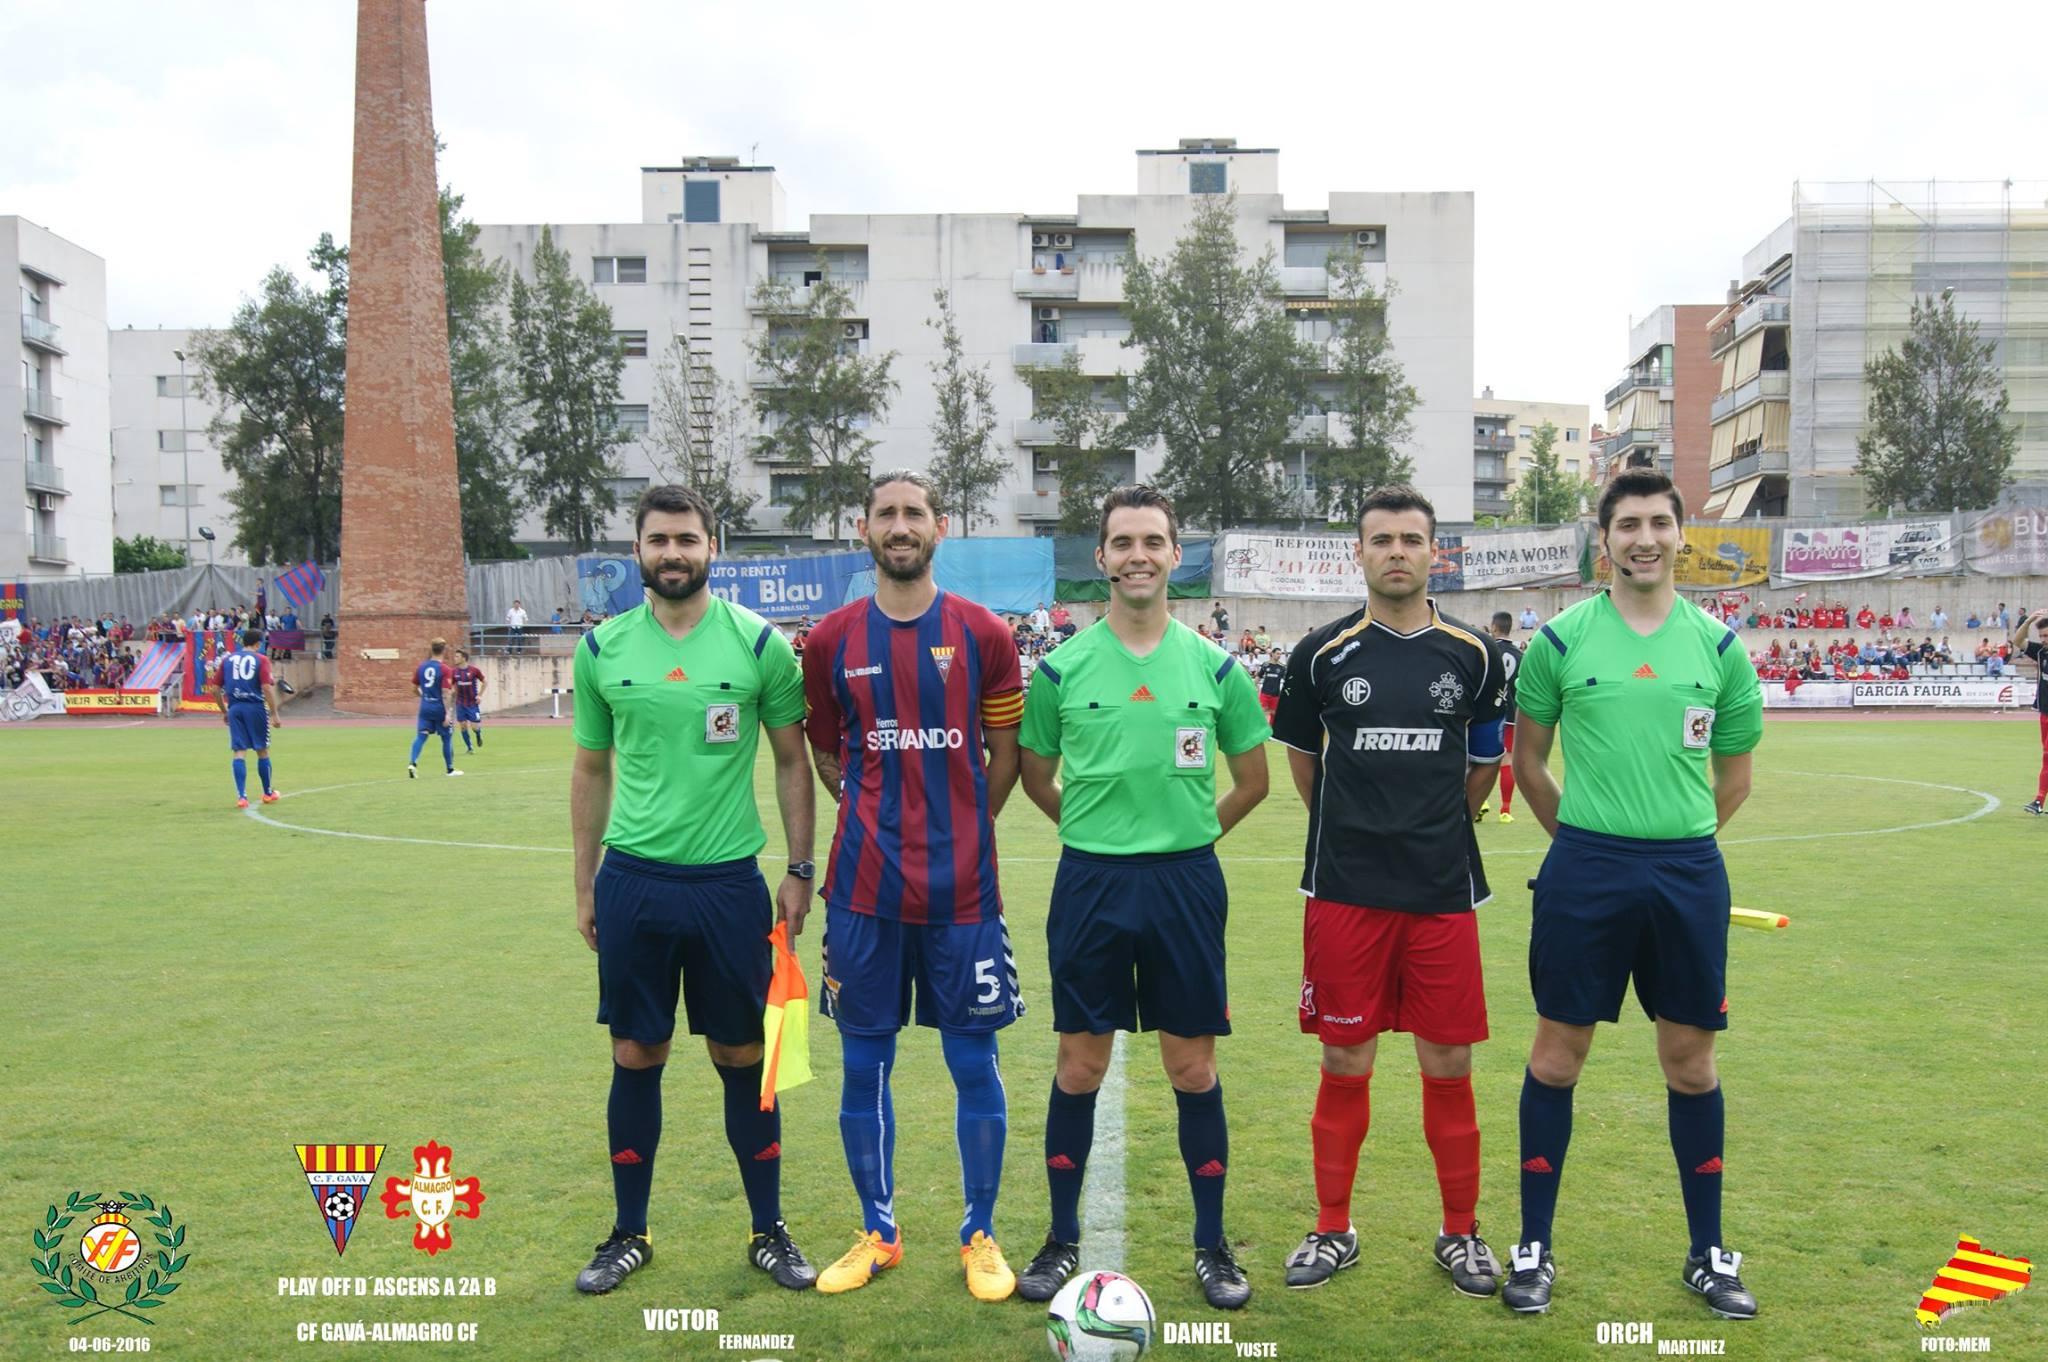 CF Gavà – Almagro CF: Daniel Yuste Querol, Víctor Fernández Pérez y Antoni Orch Martínez